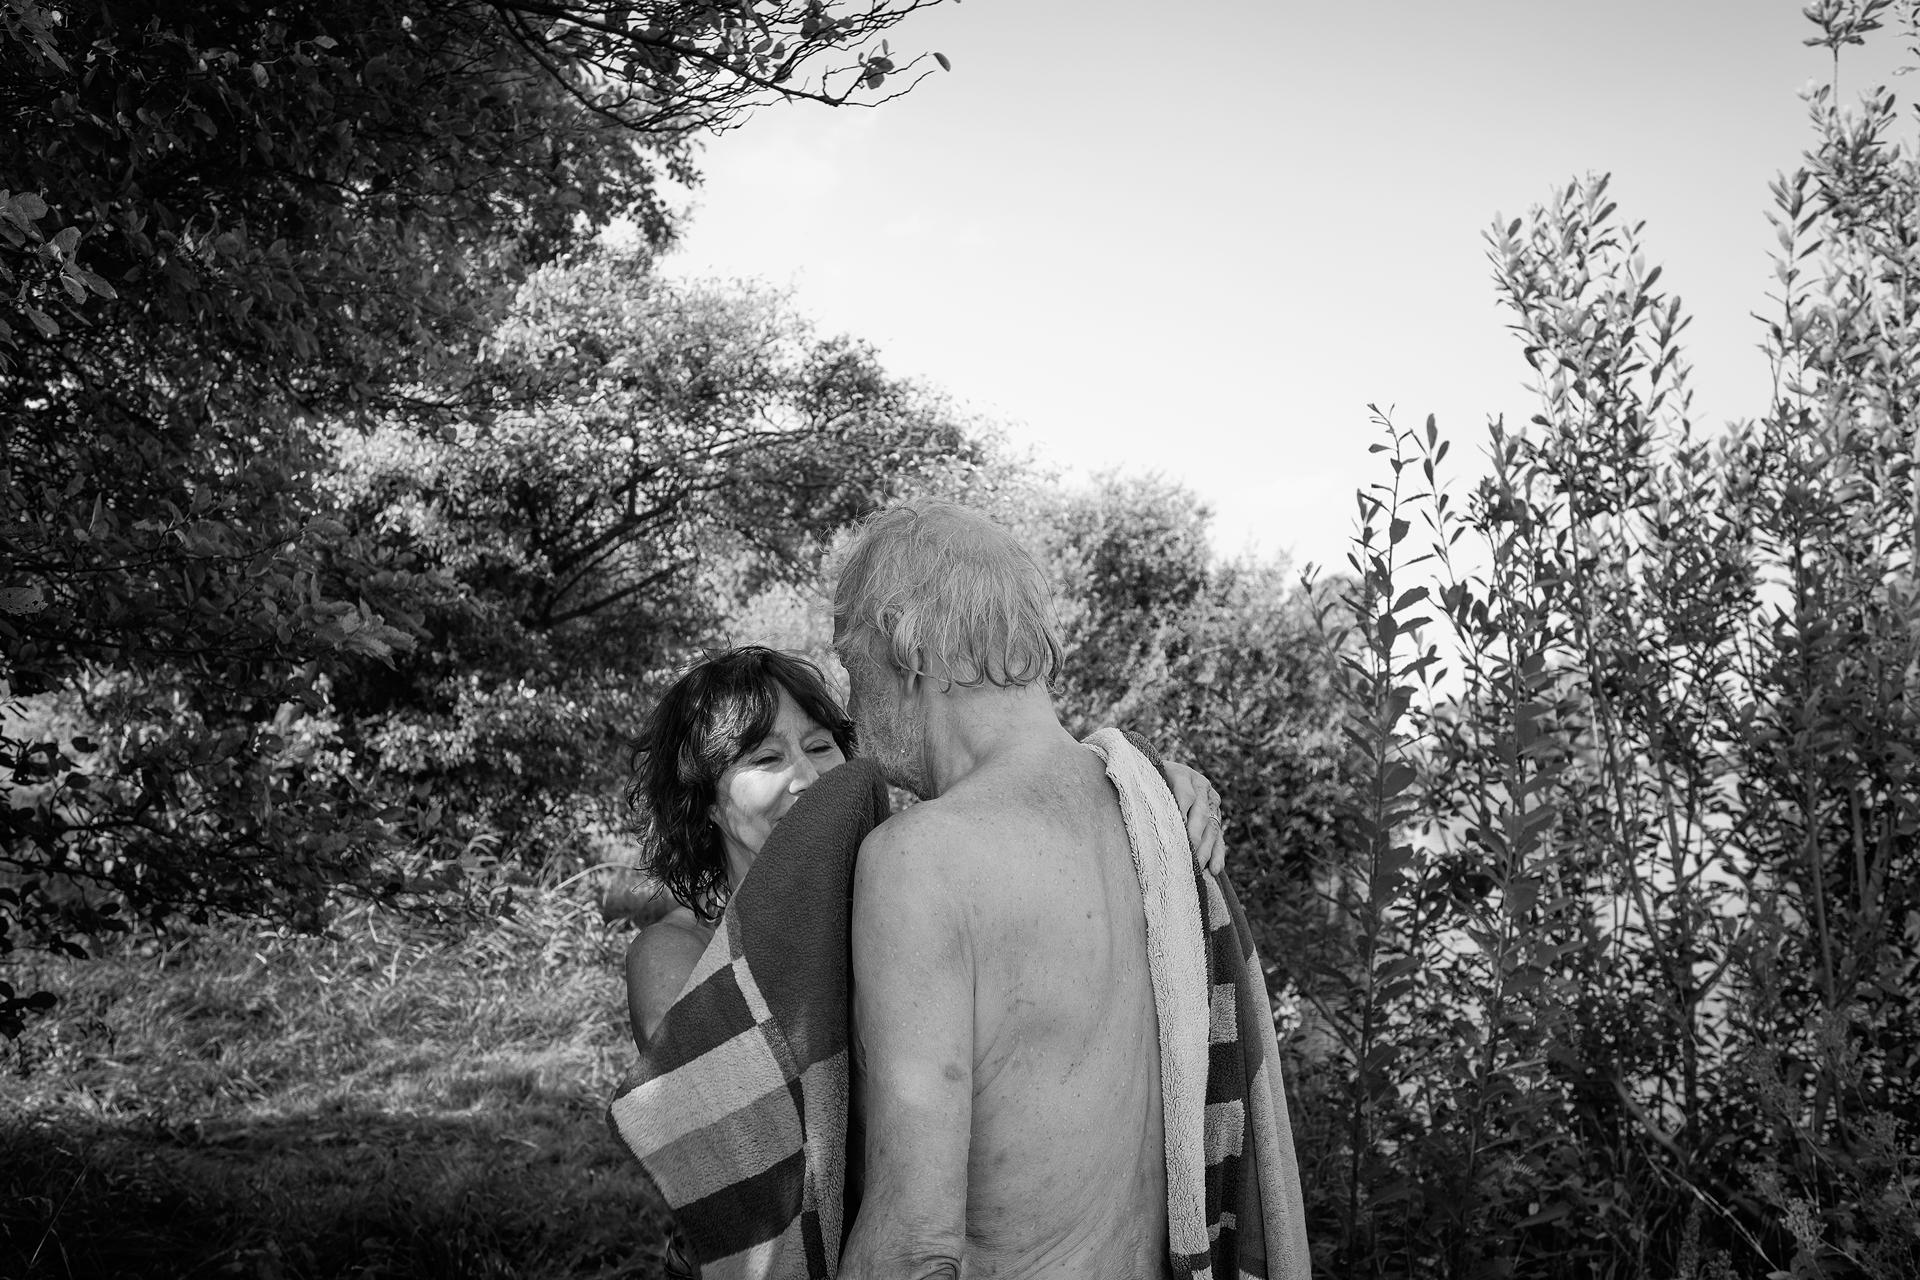 Mirja Maria Thiel - Portrait of an Artist as an Old Man - Felix Schoeller Photoaward